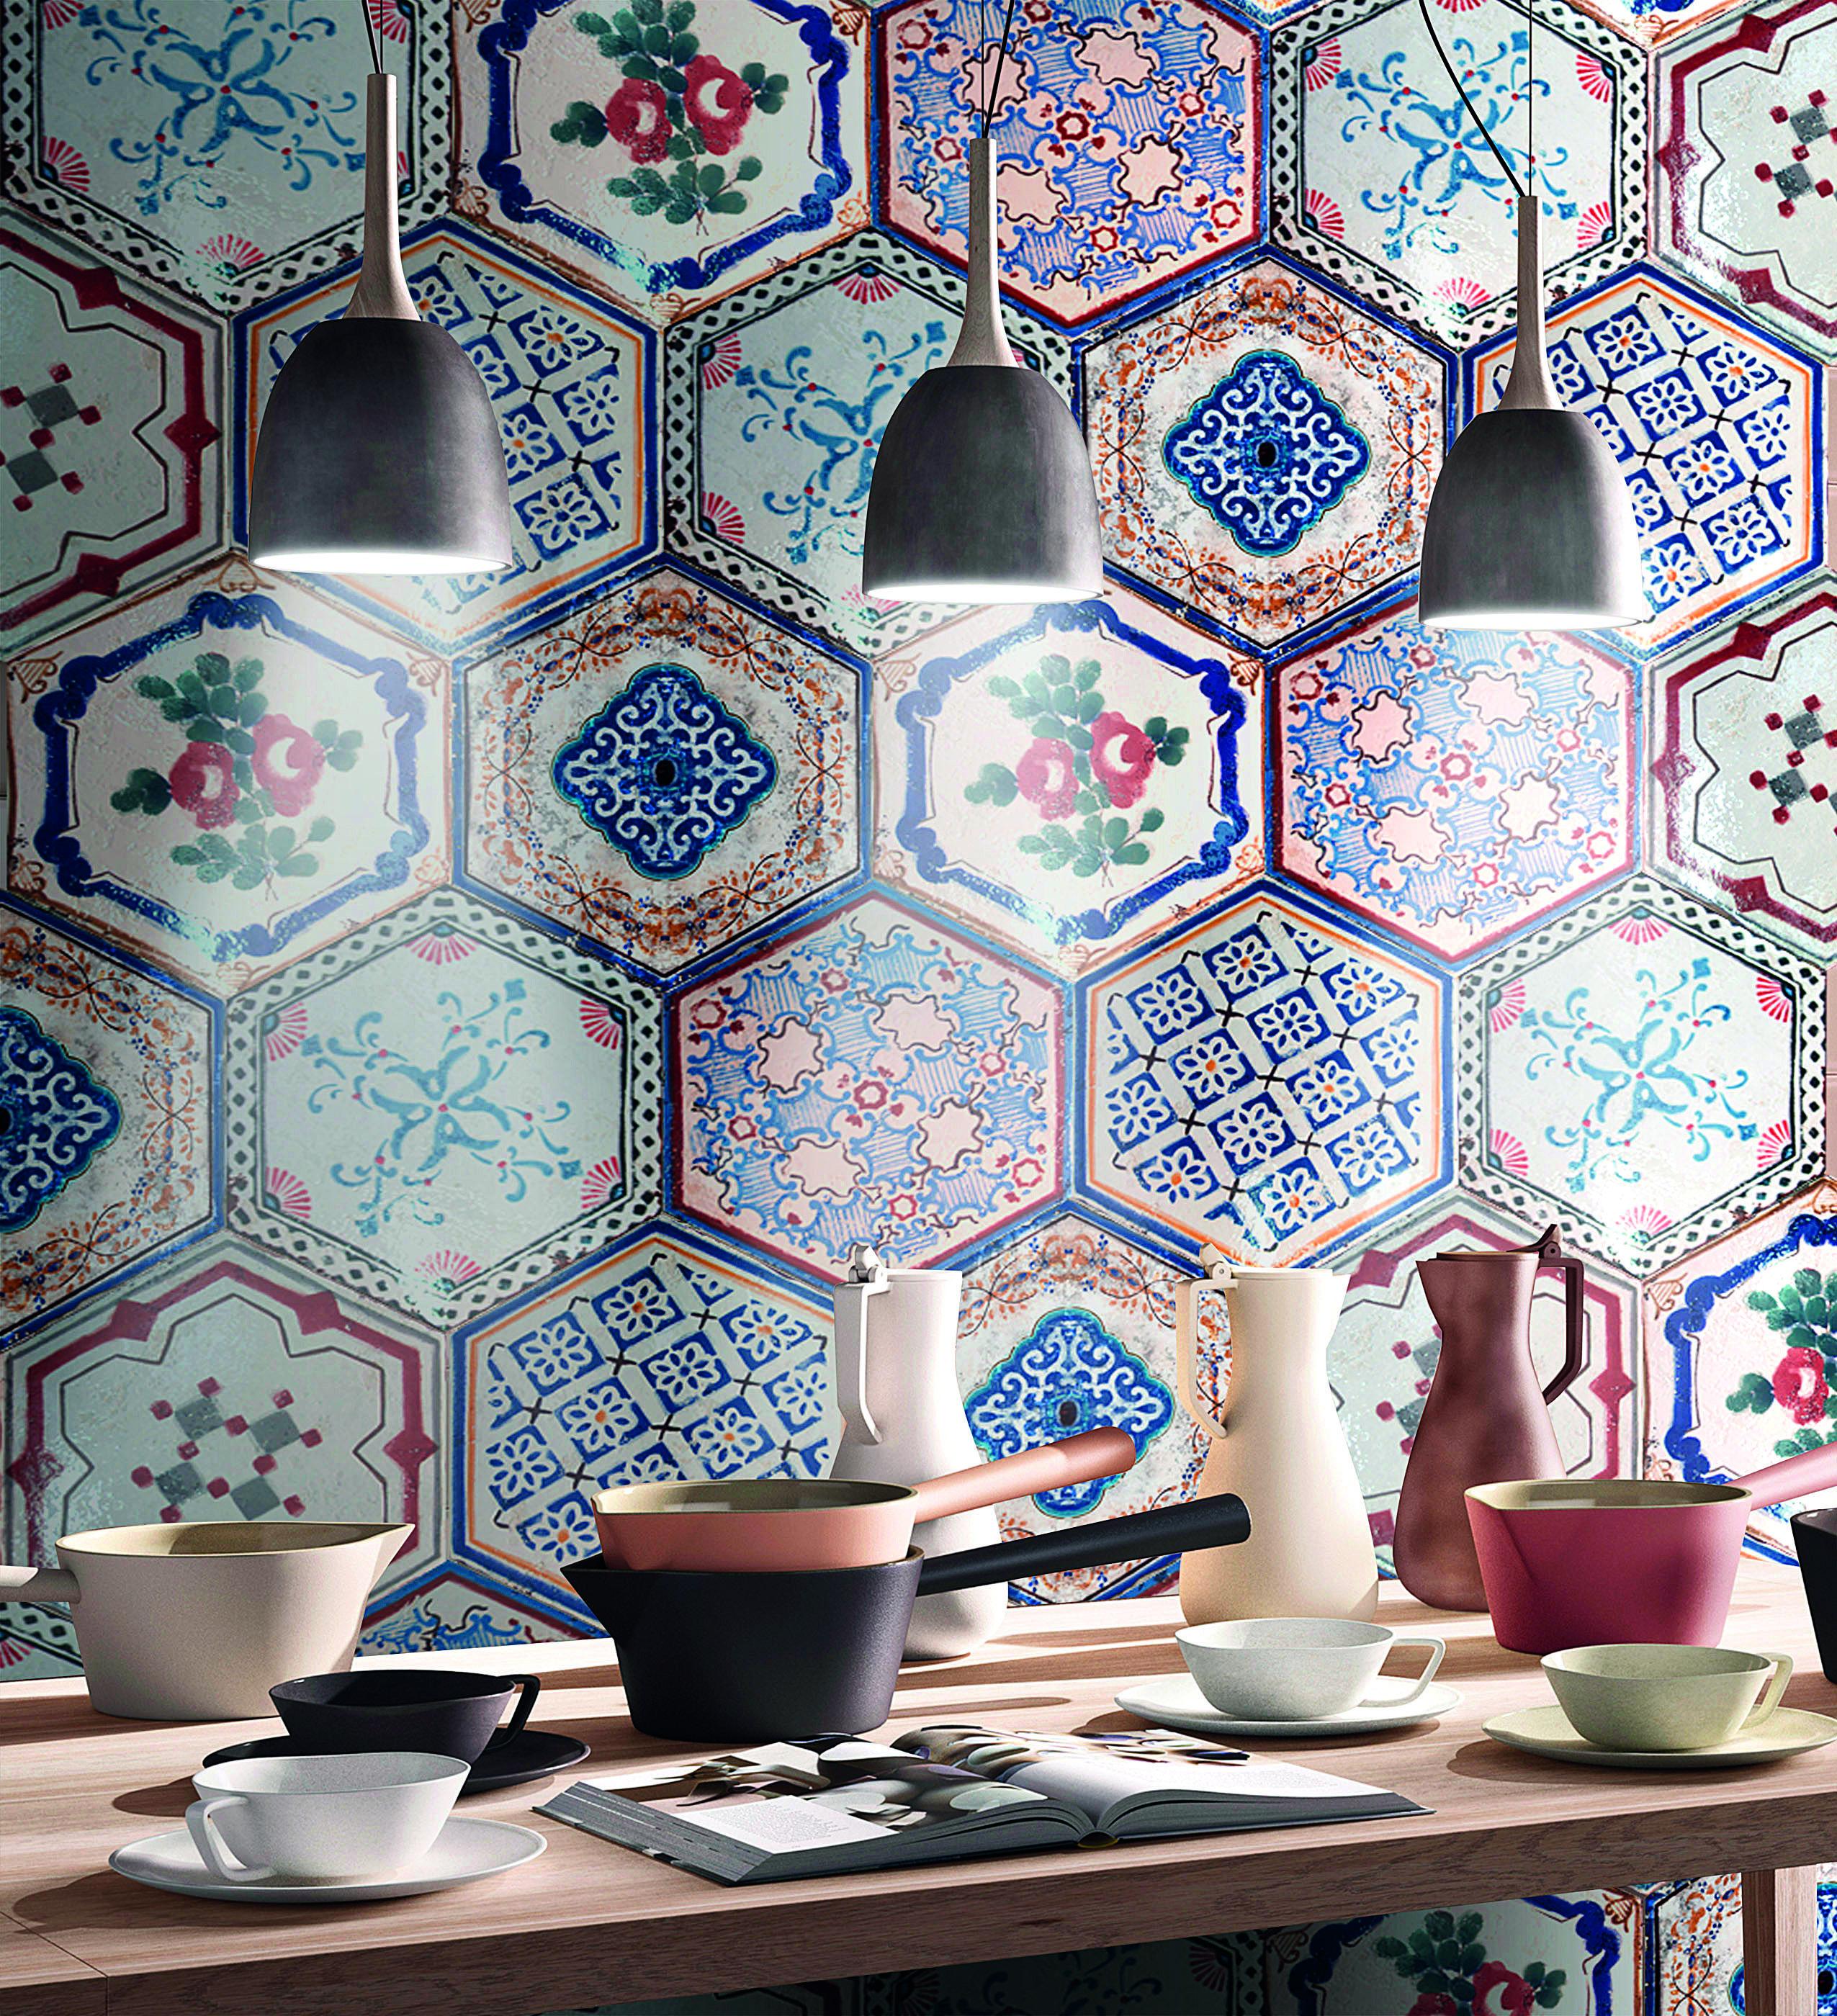 Wow! #küche #modern #design #fliesen #tiles #bunt #farbenfroh ...